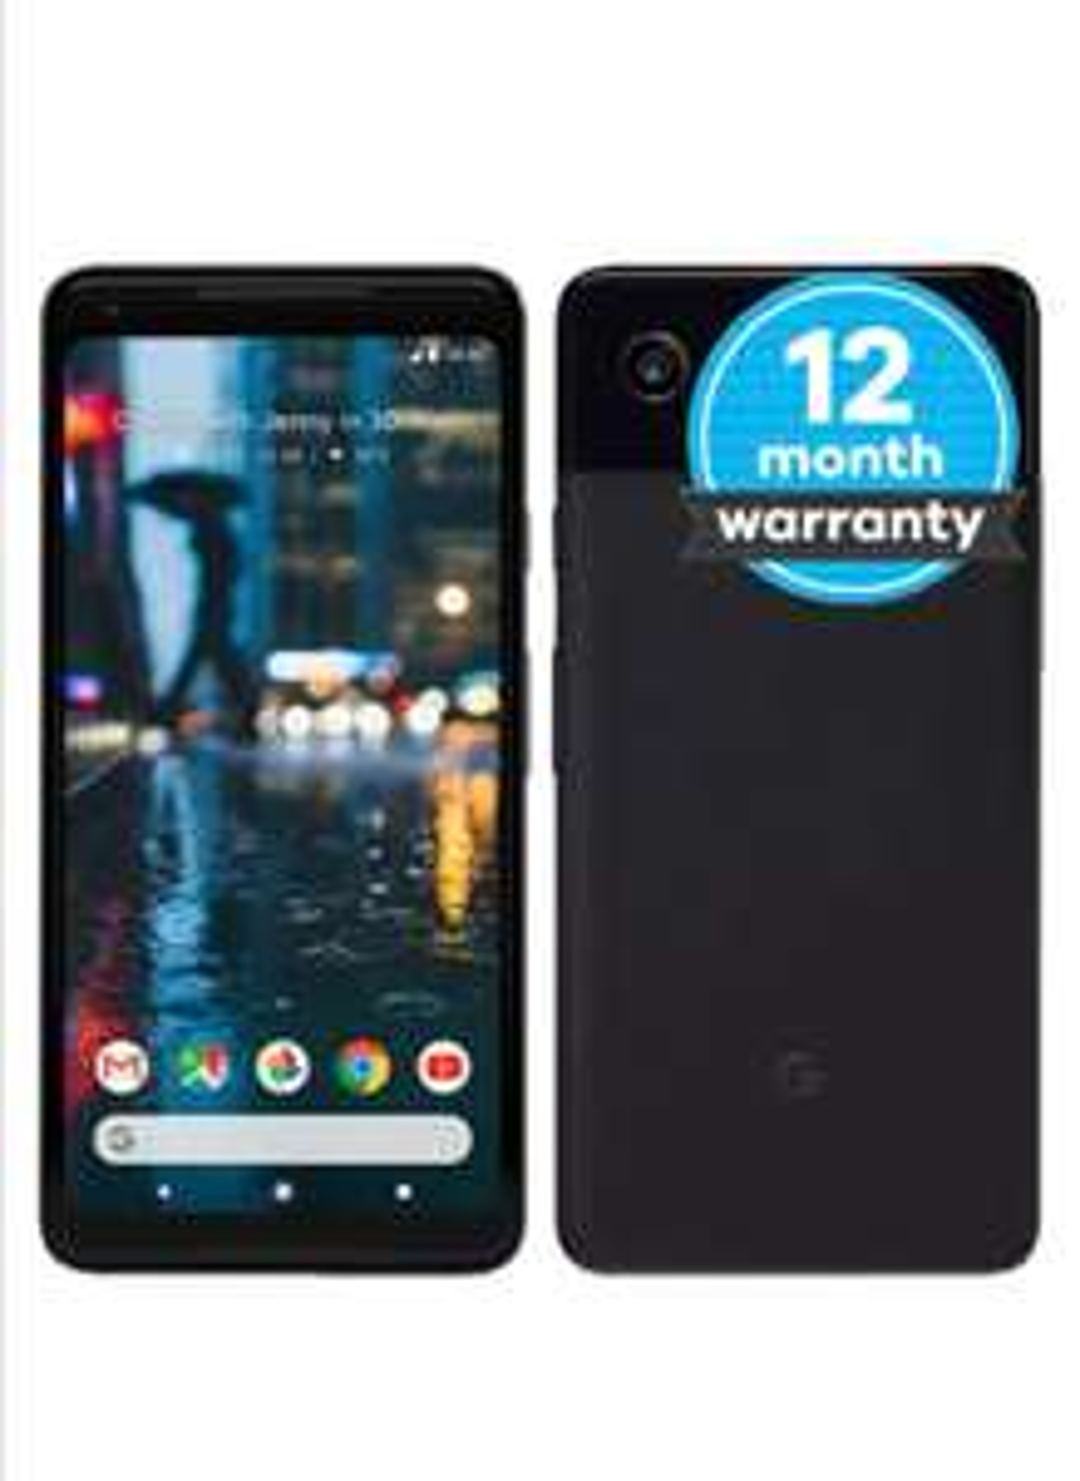 Google Pixel 2XL 64GB Refurbished Good Condition Smartphone £160 @ Music Magpie Ebay